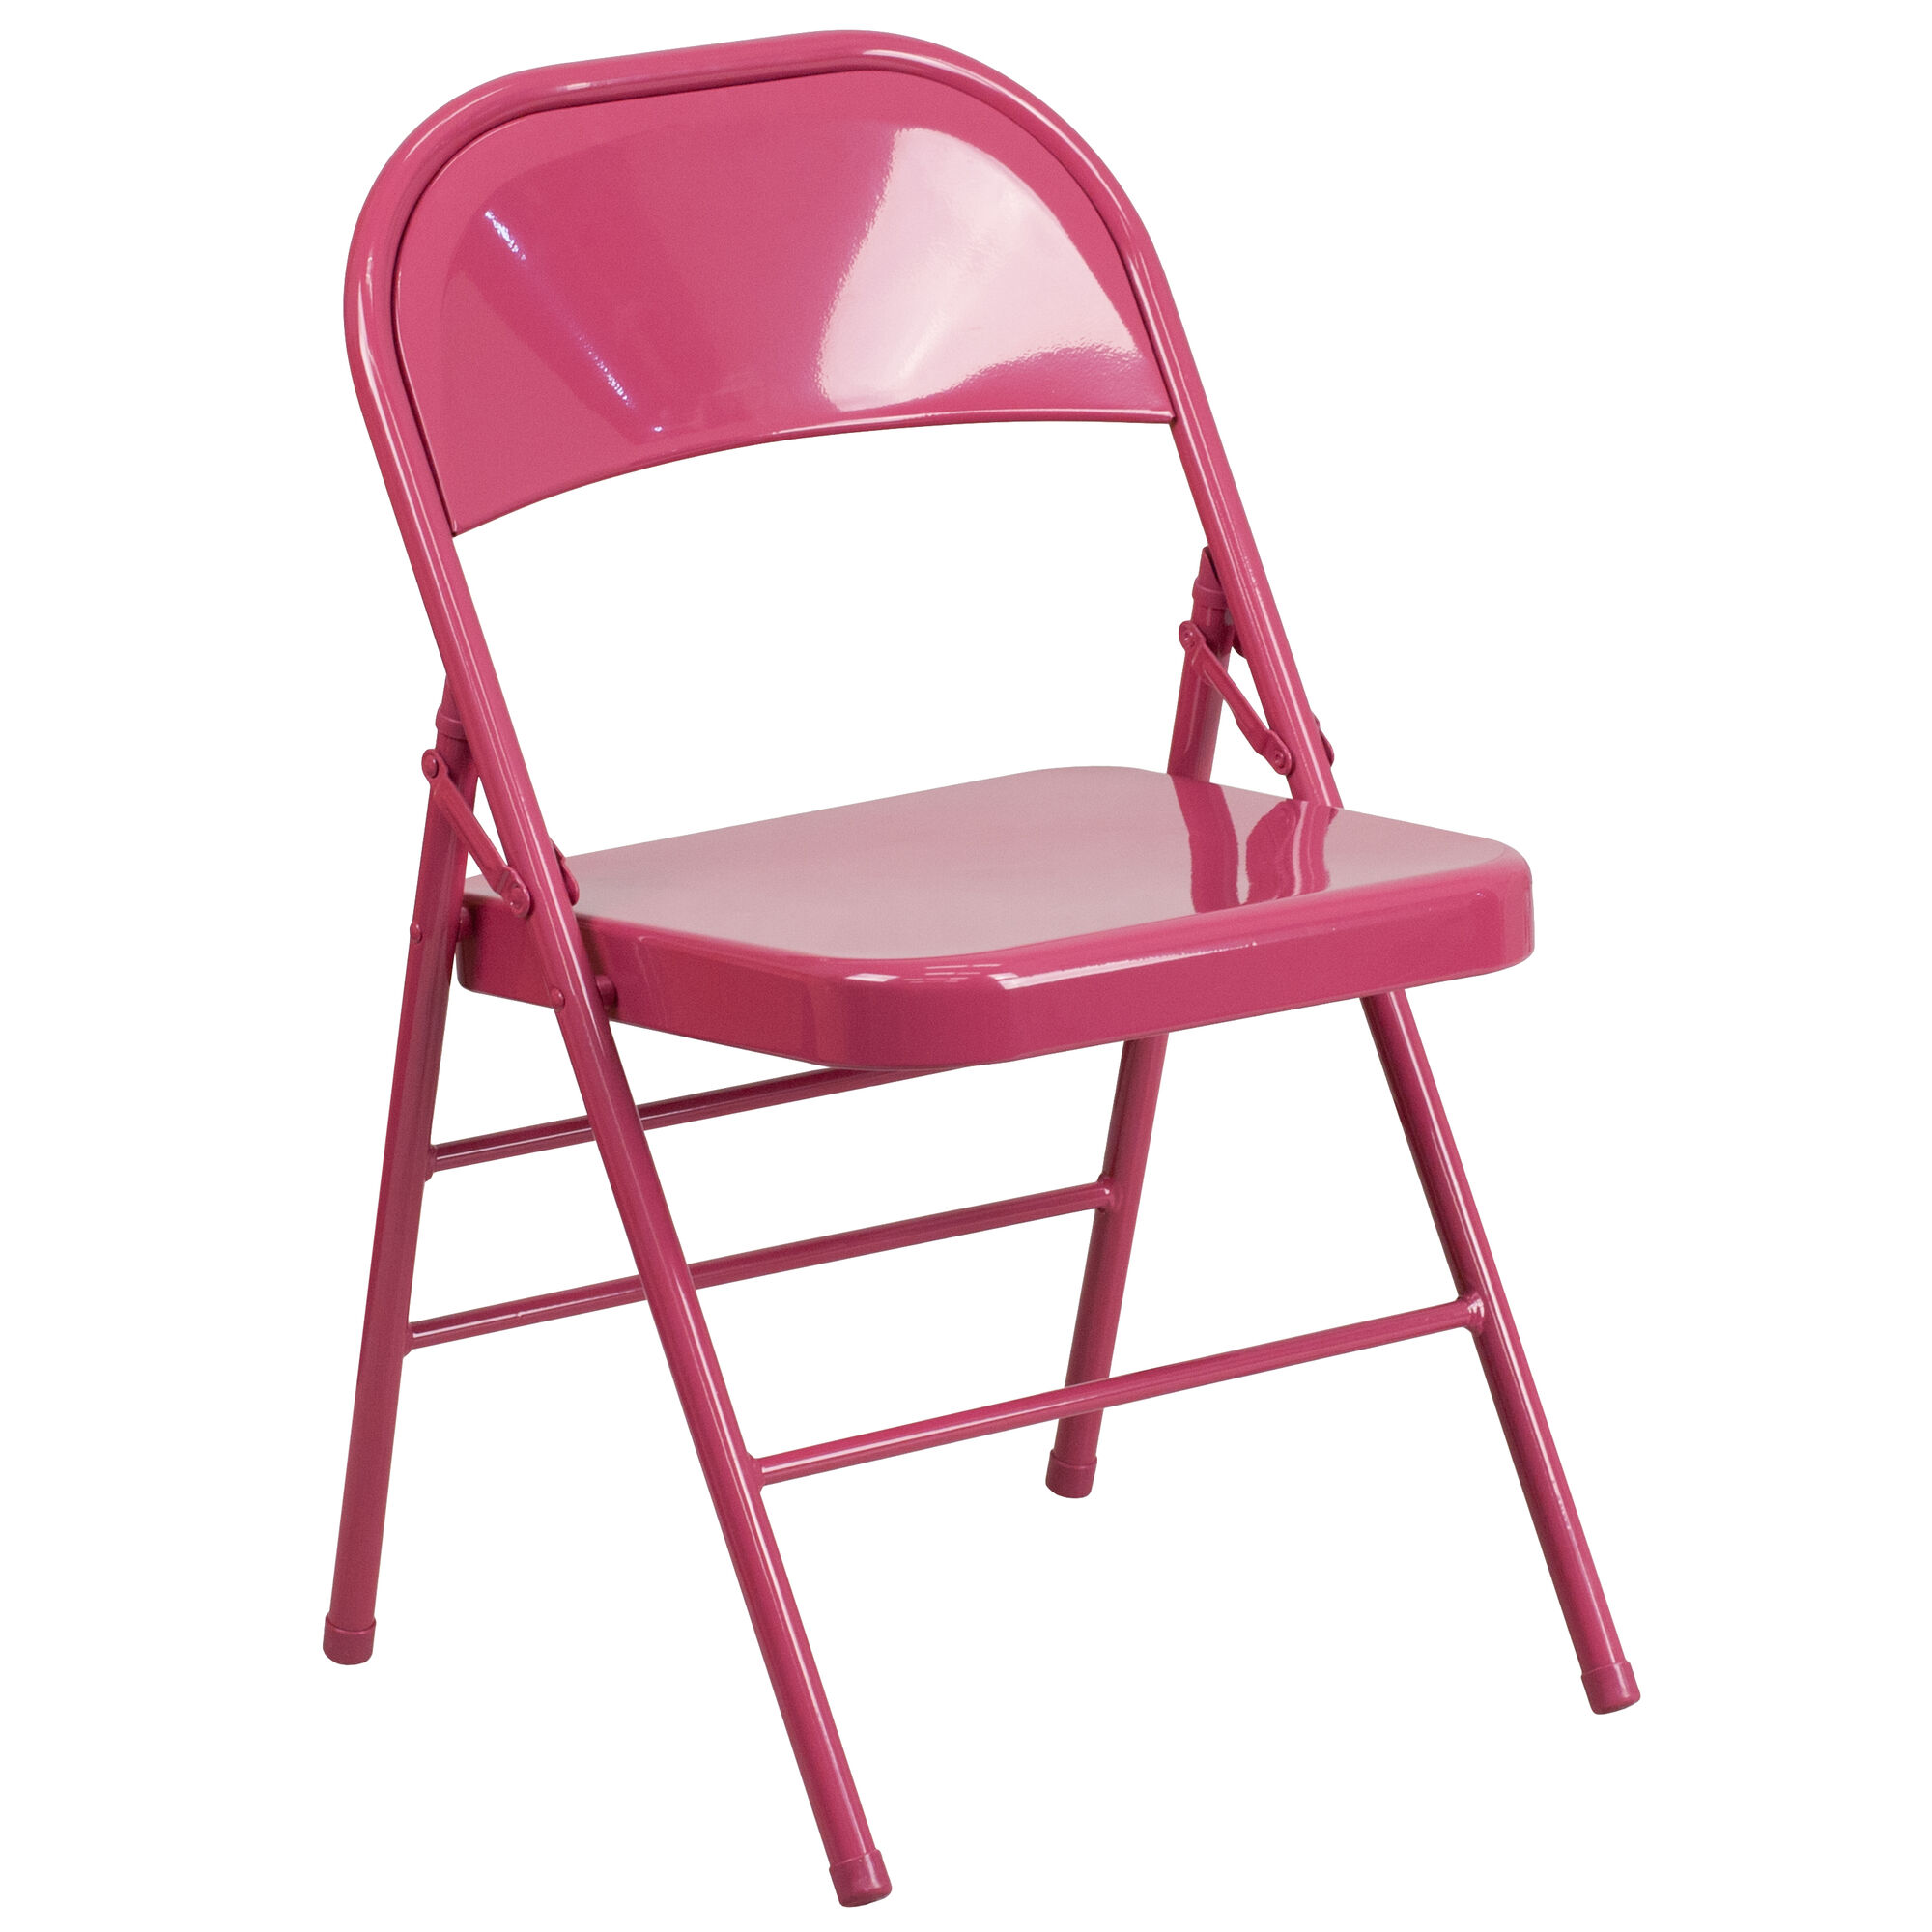 Fuchsia Folding Chair Hf3 Fuchsia Gg Foldingchairs4less Com